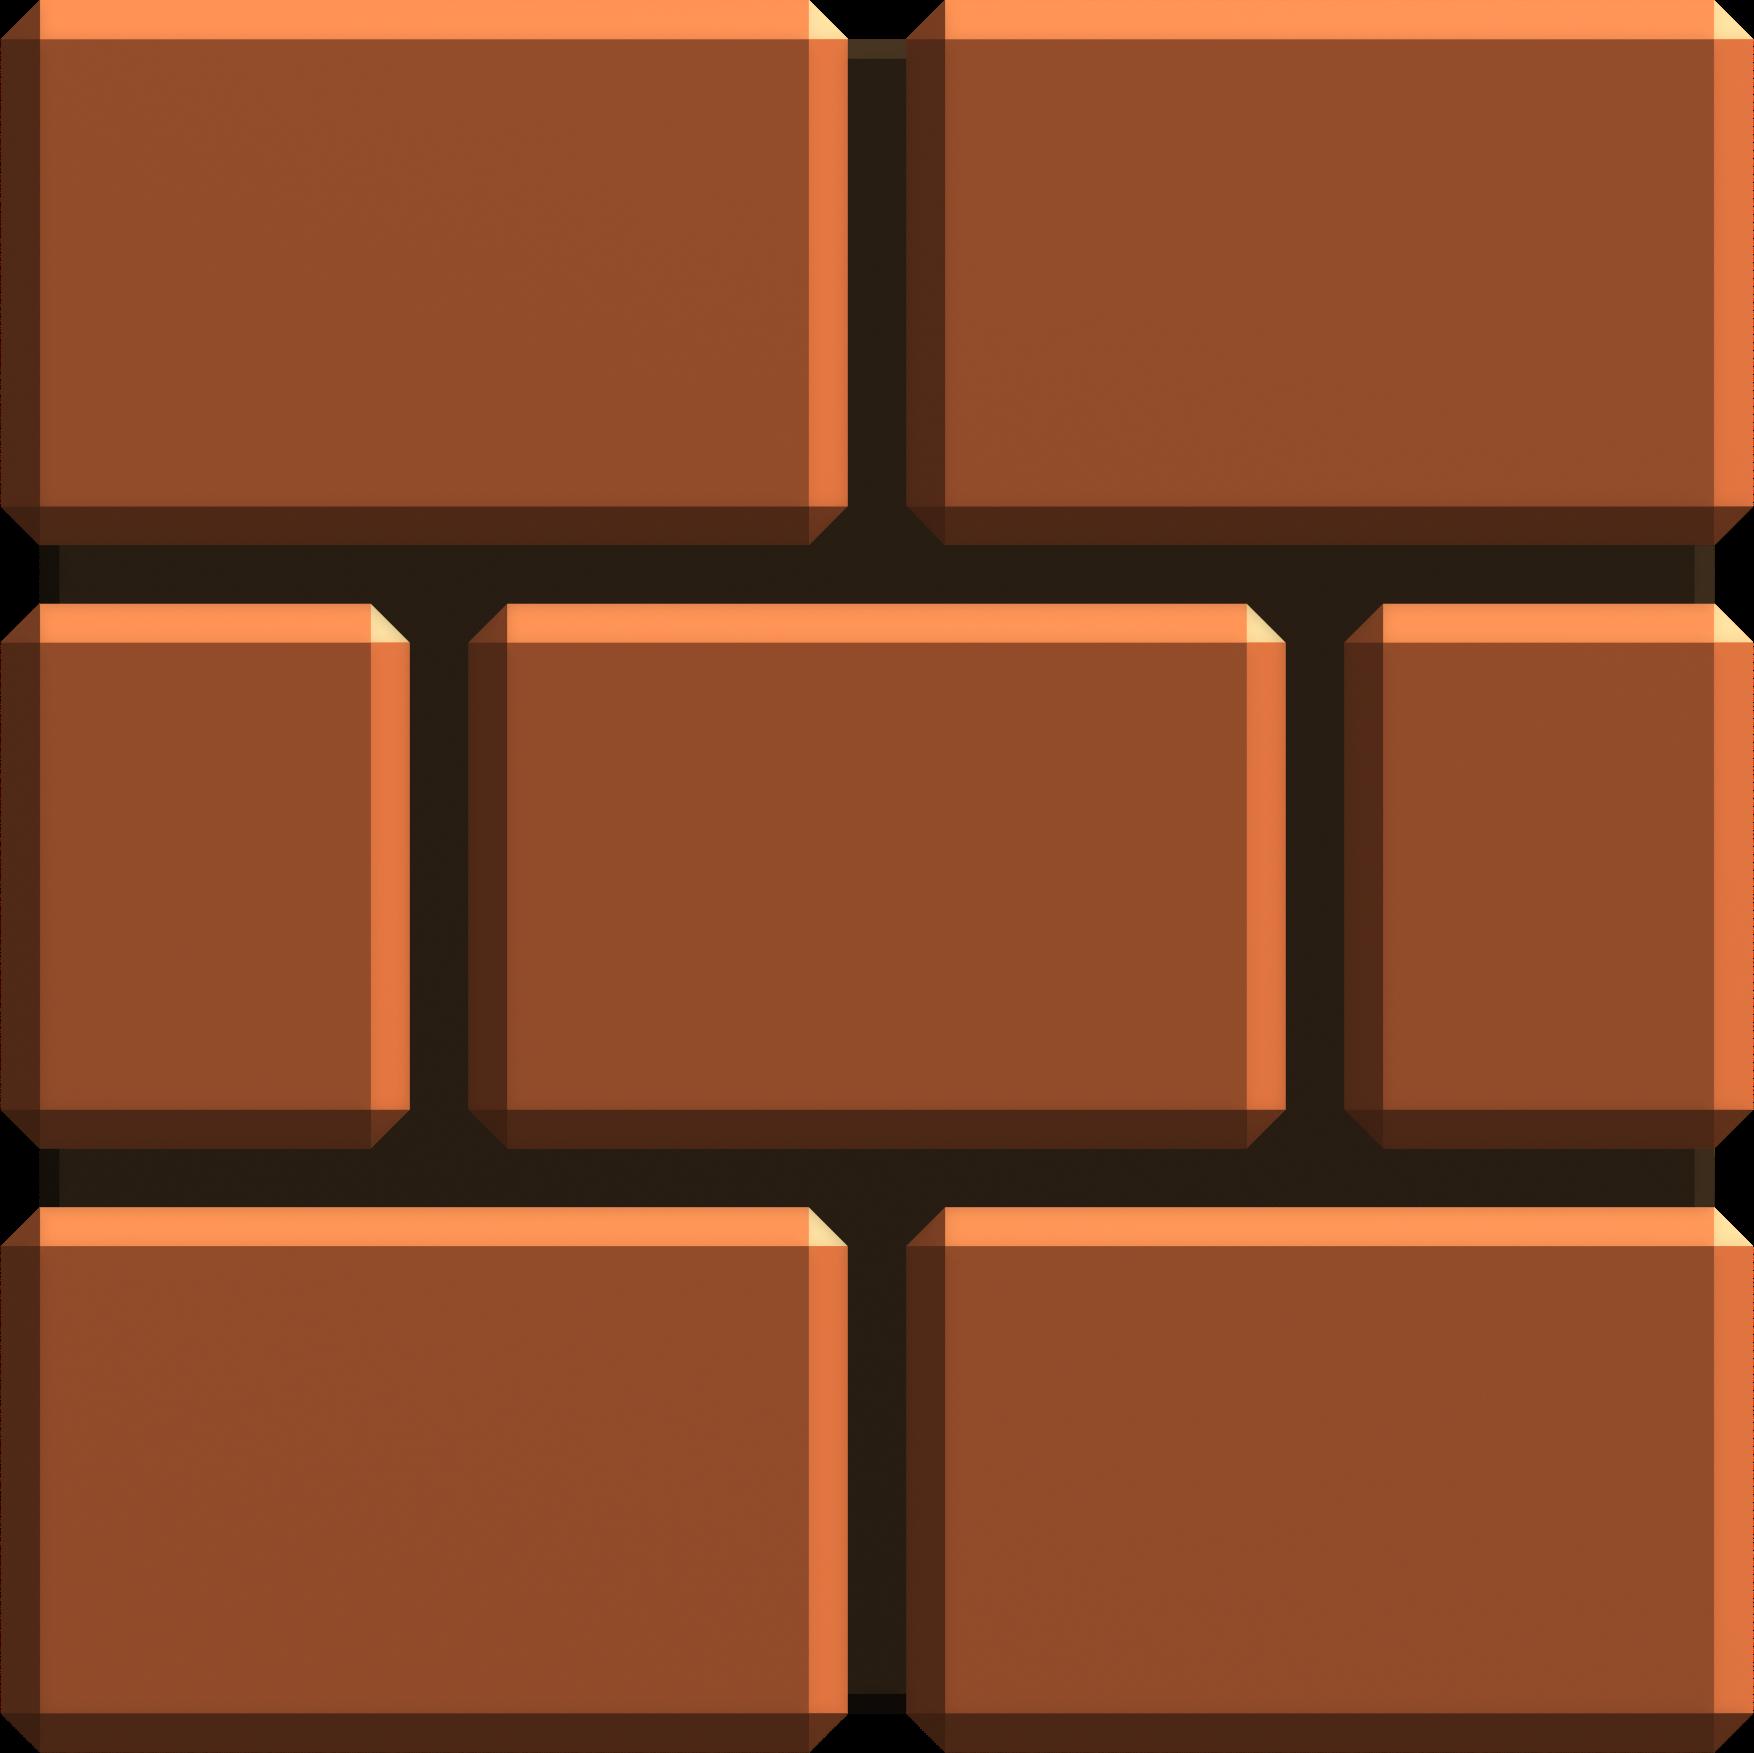 Brick Block Fantendo Nintendo Fanon Wiki Fandom Powered By Wikia